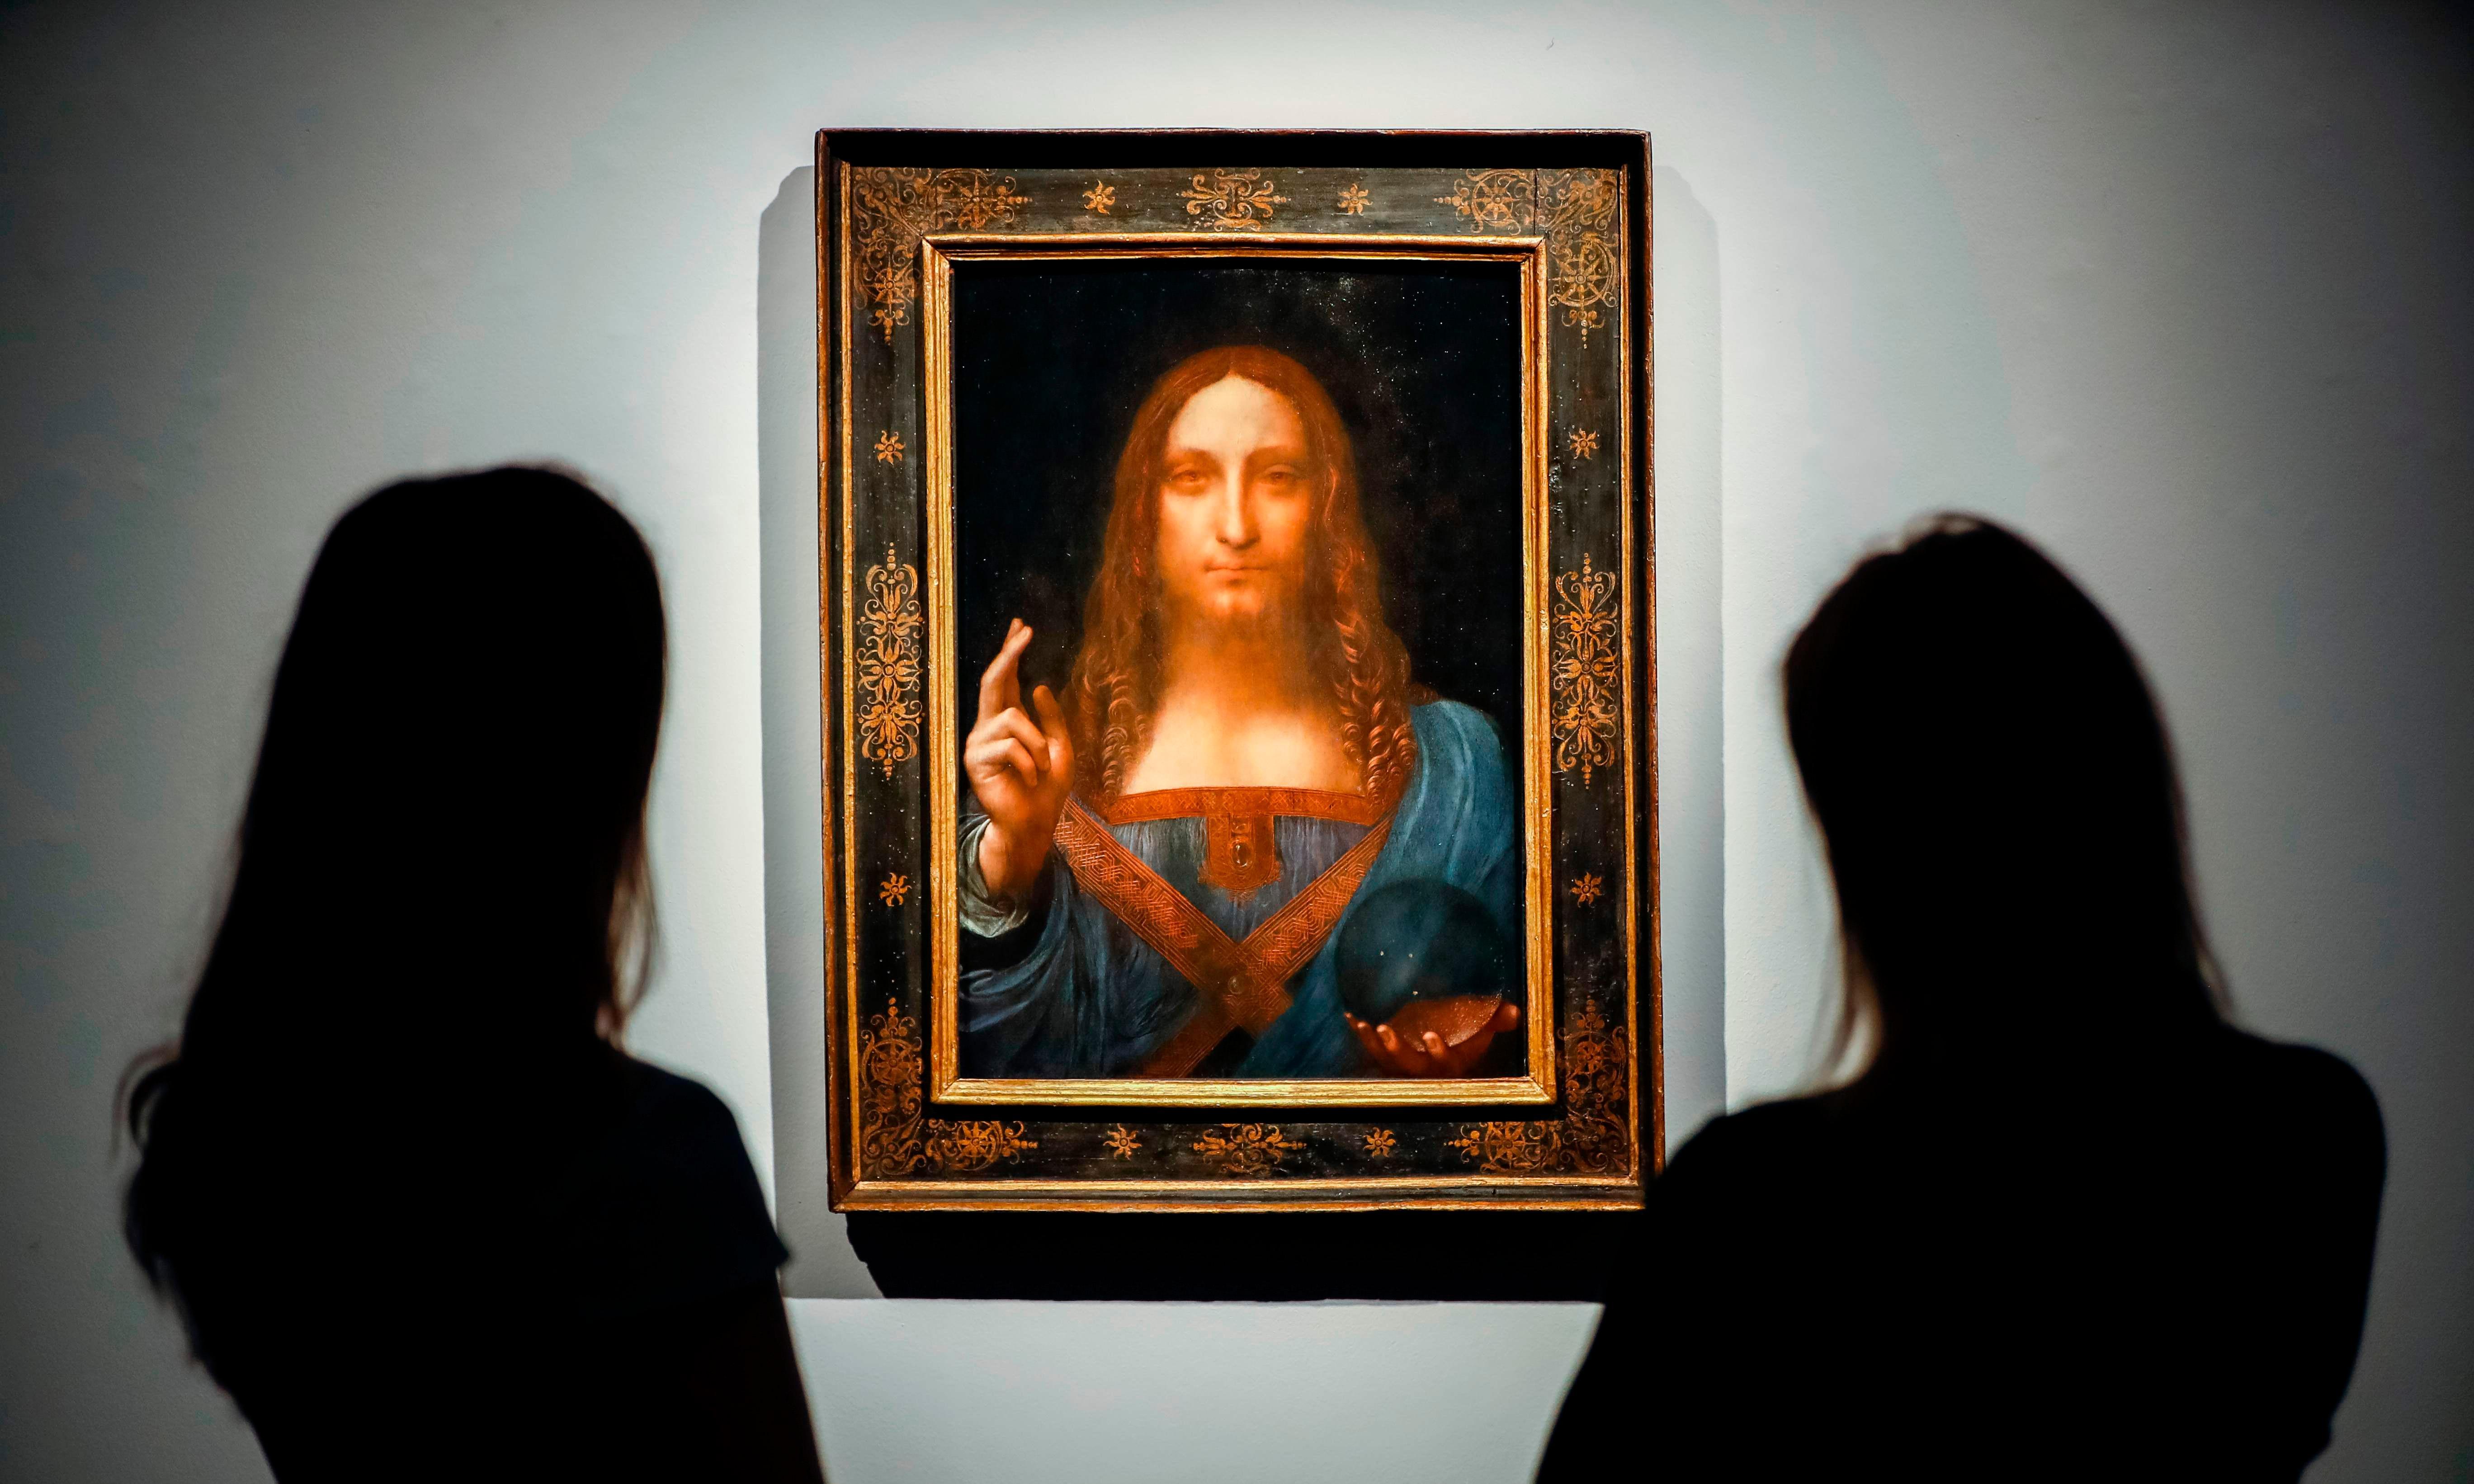 The lost Leonardo? Louvre show ditches Salvator Mundi over authenticity doubts